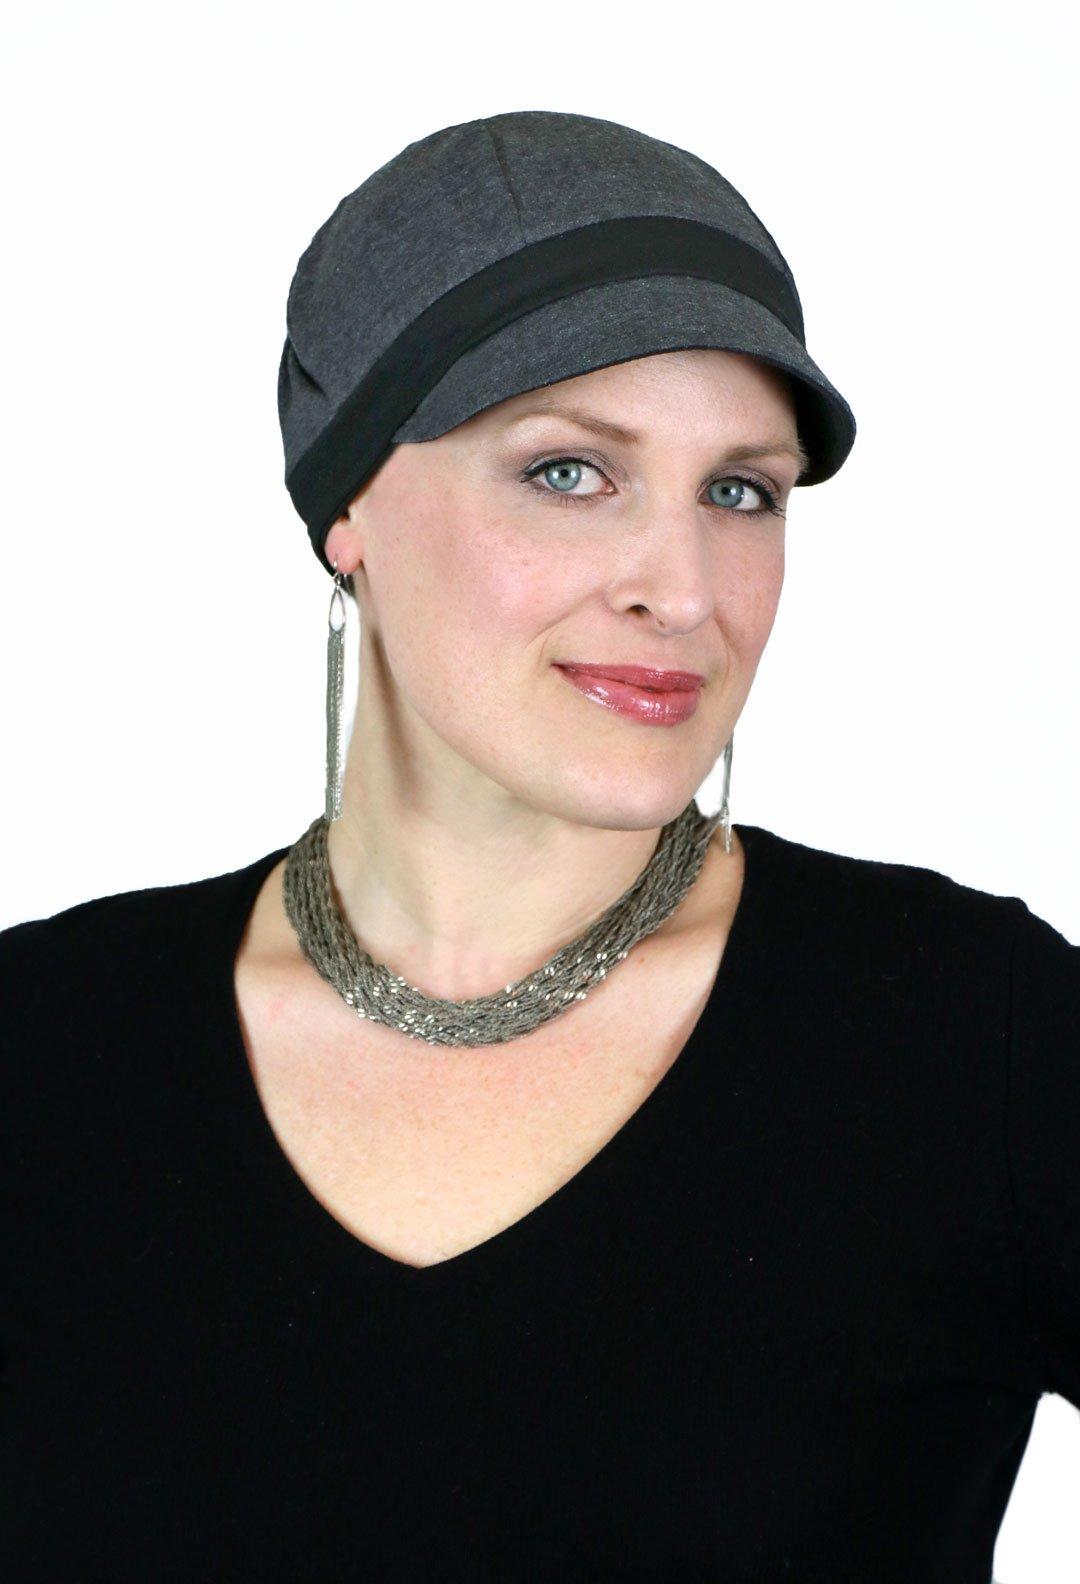 Chemo Hats for Women Cancer Headwear Headcoverings Cute Baseball Caps Whimsy Sport (Dark Grey)